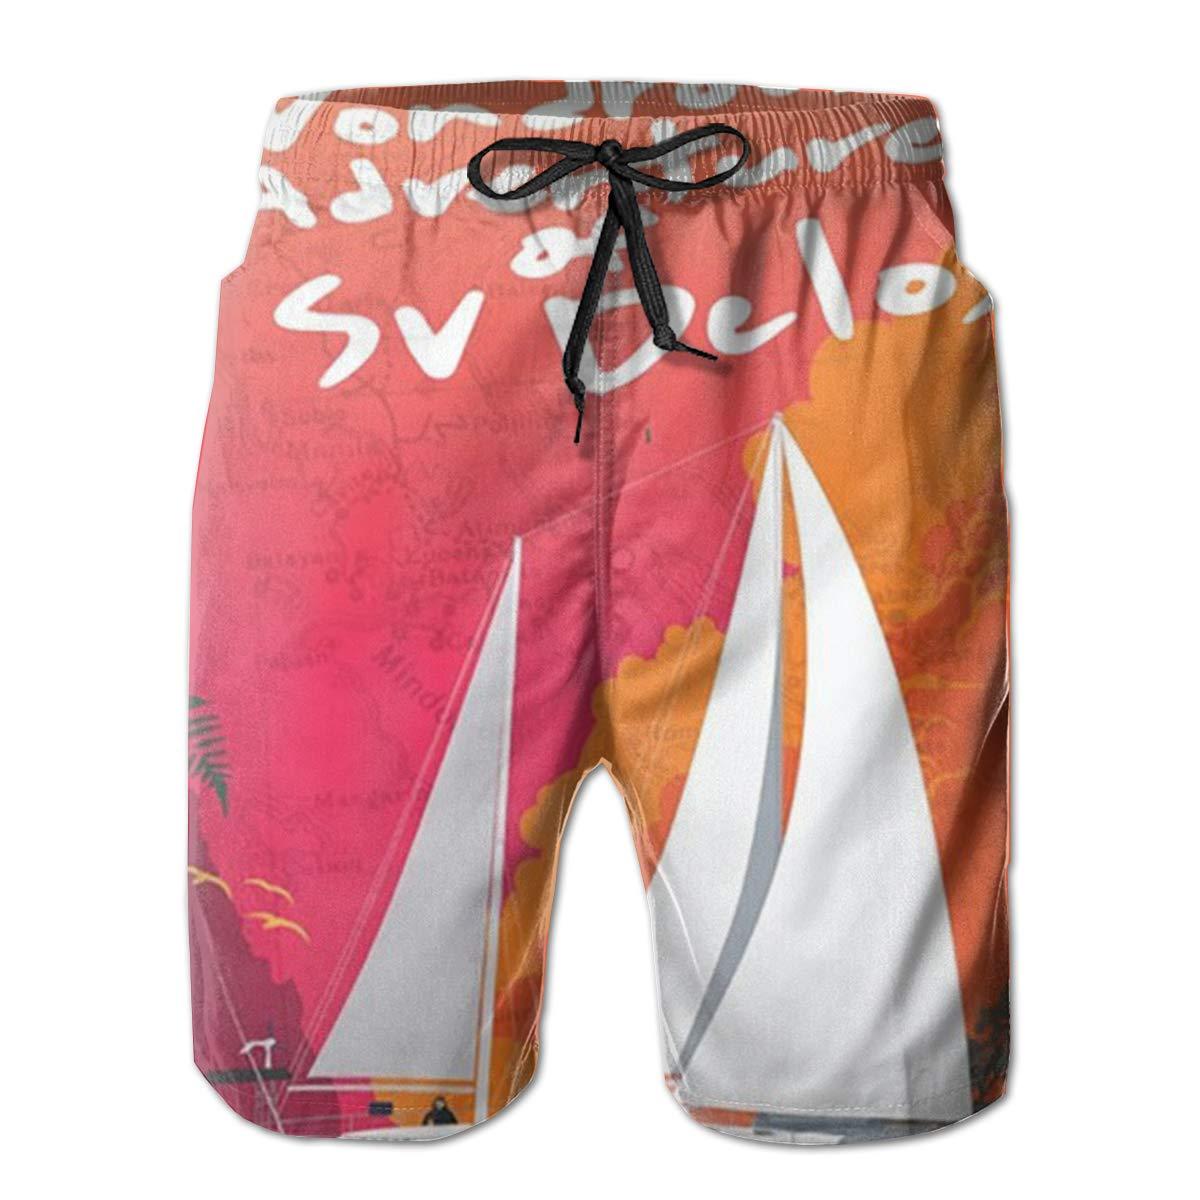 EYFlife Adventures of Sv Dclos Men/â/€s Beach Board Shorts Quick Dry Swim Truck Shorts